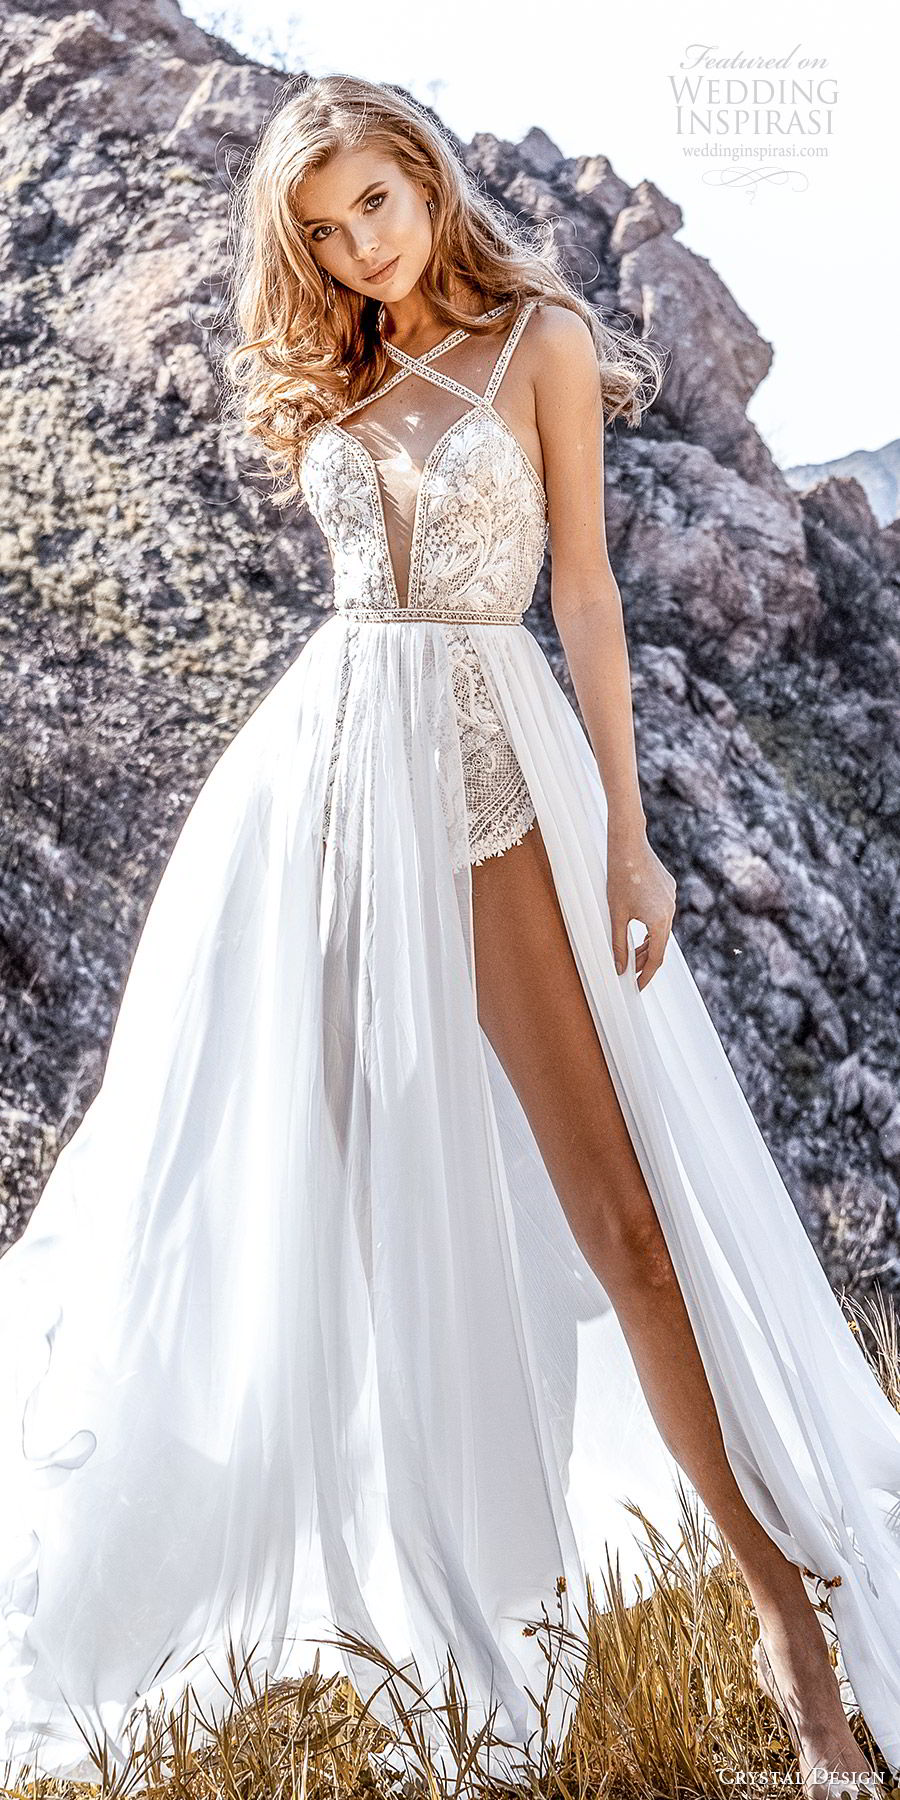 crystal design 2020 couture bridal sleeveless beaded straps plunging split sweetheart neckline bodysuit aline wedding dress slit sheer skirt (2) sexy modern chapel train mv